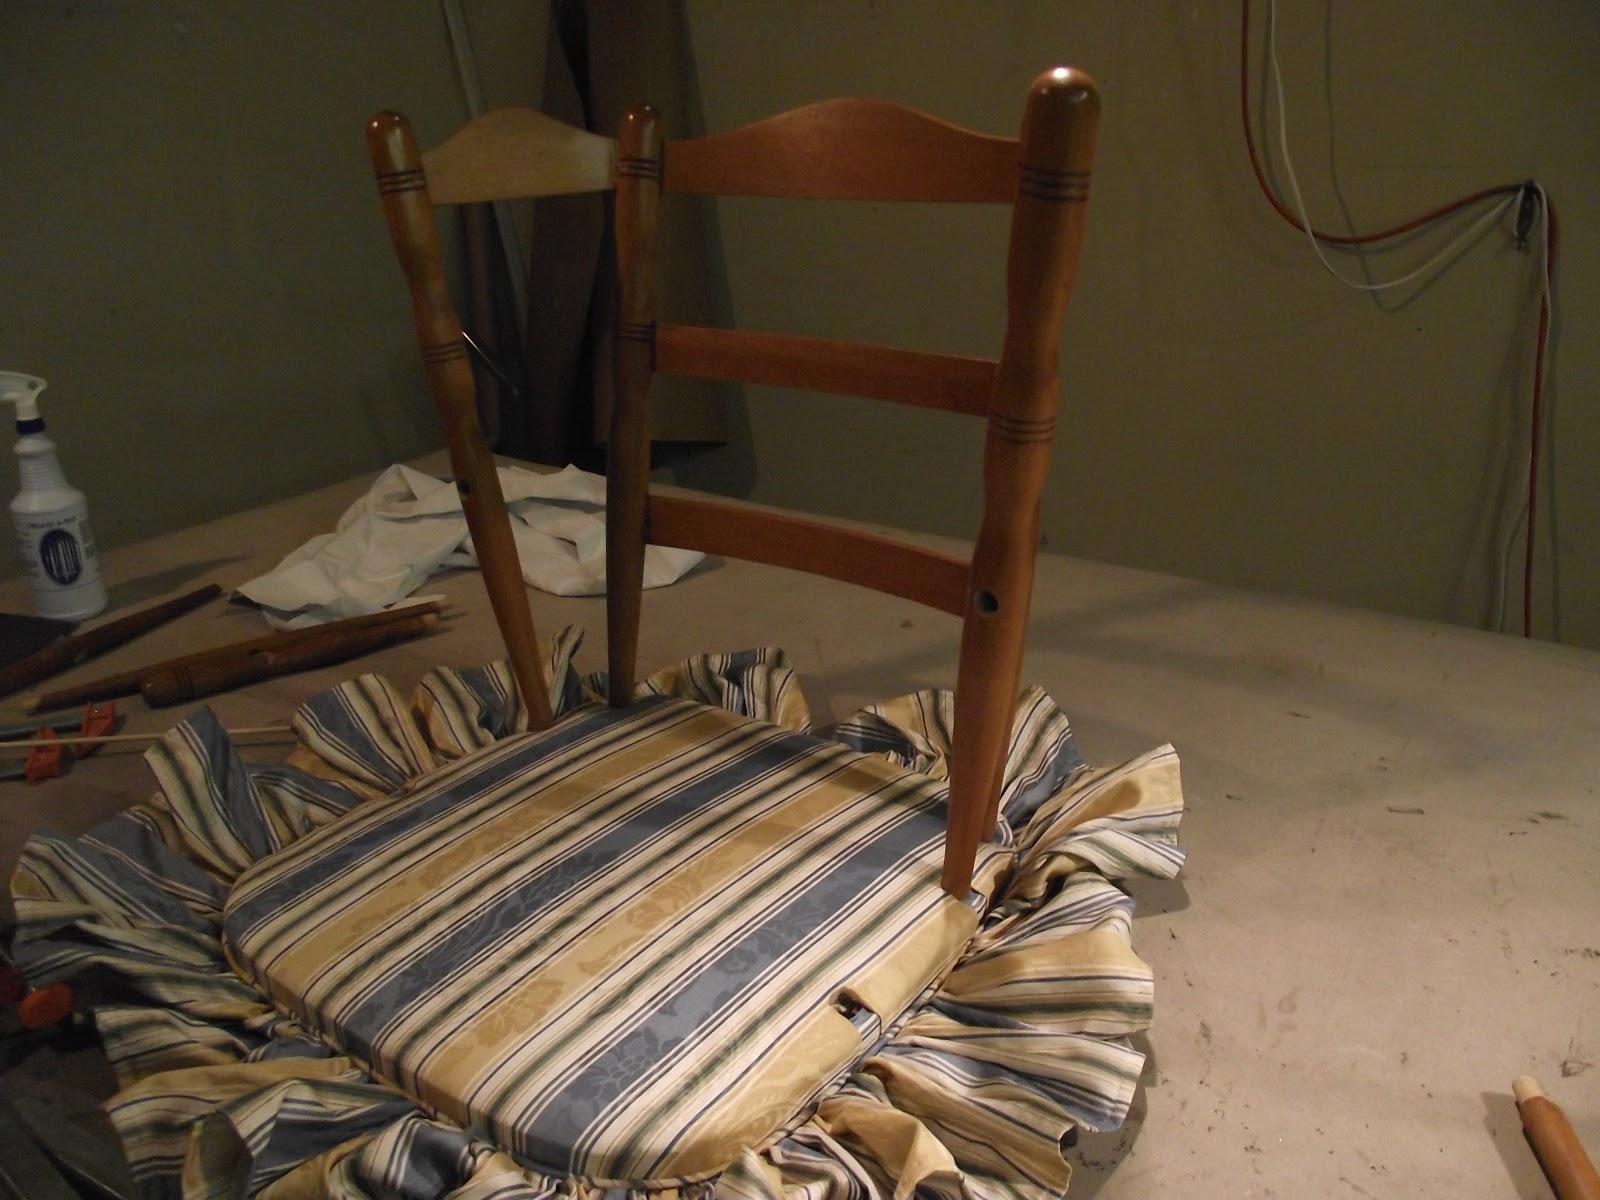 Wood Glues Furniture ~ How to re glue old wood furniture gantt s decorating